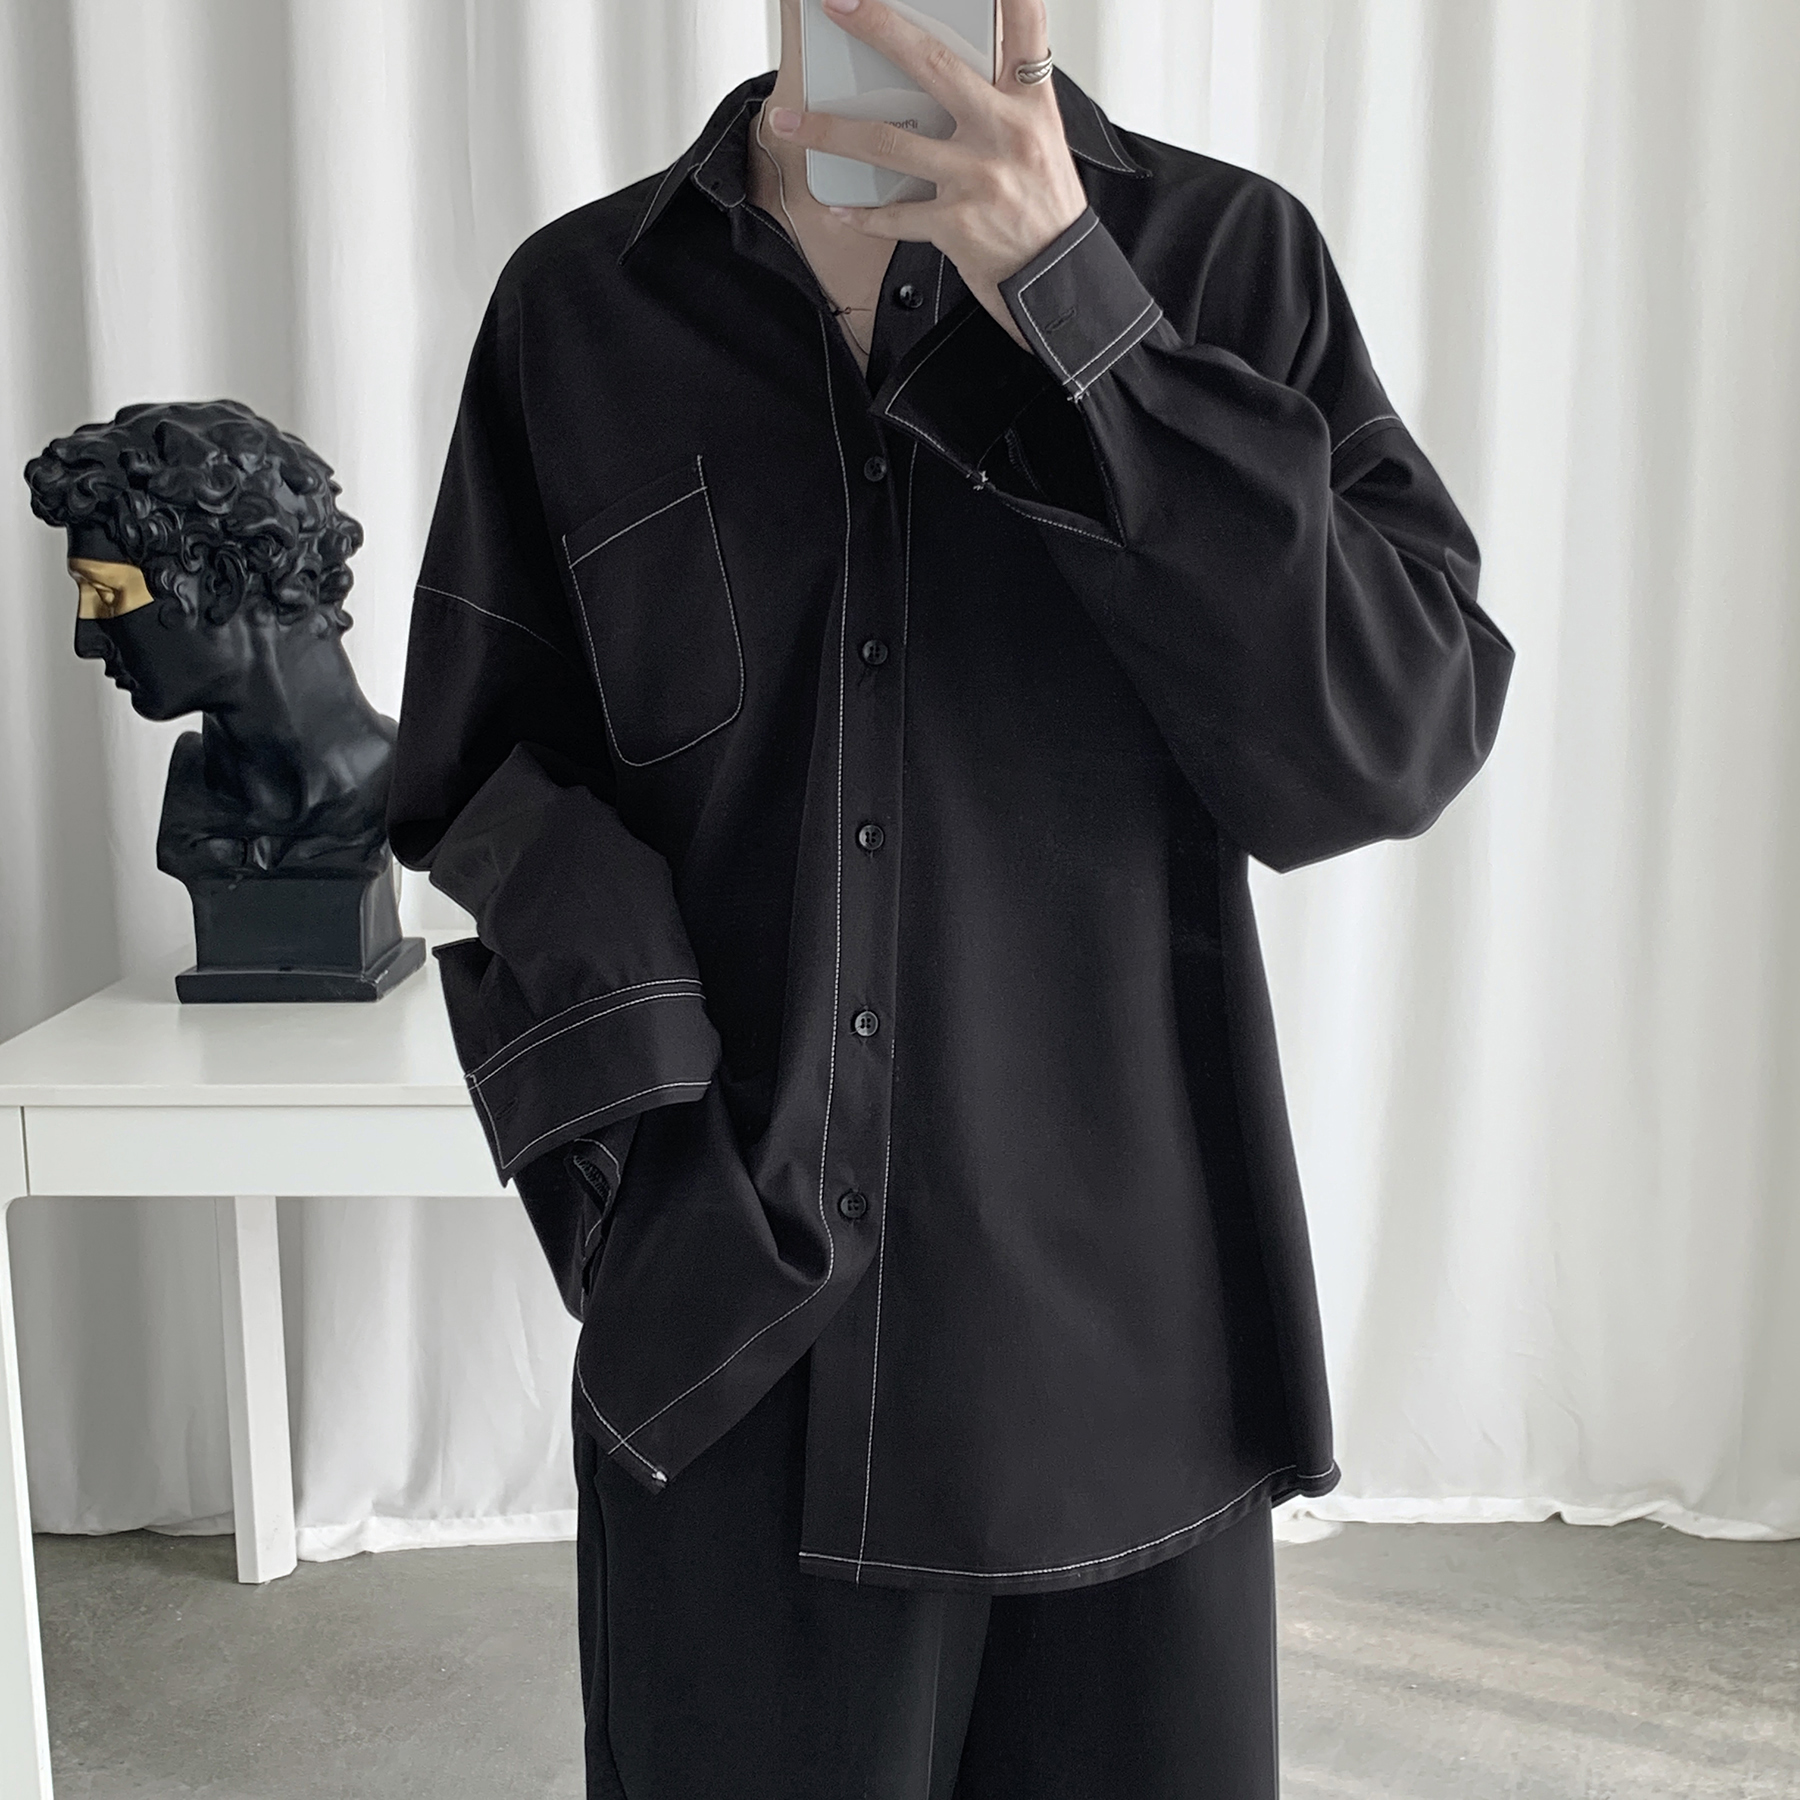 2019 Fashion Men Shirt Long Sleeve Korean Style Ulzzang Topstitched Design Solid  Street Wear Men Shirts